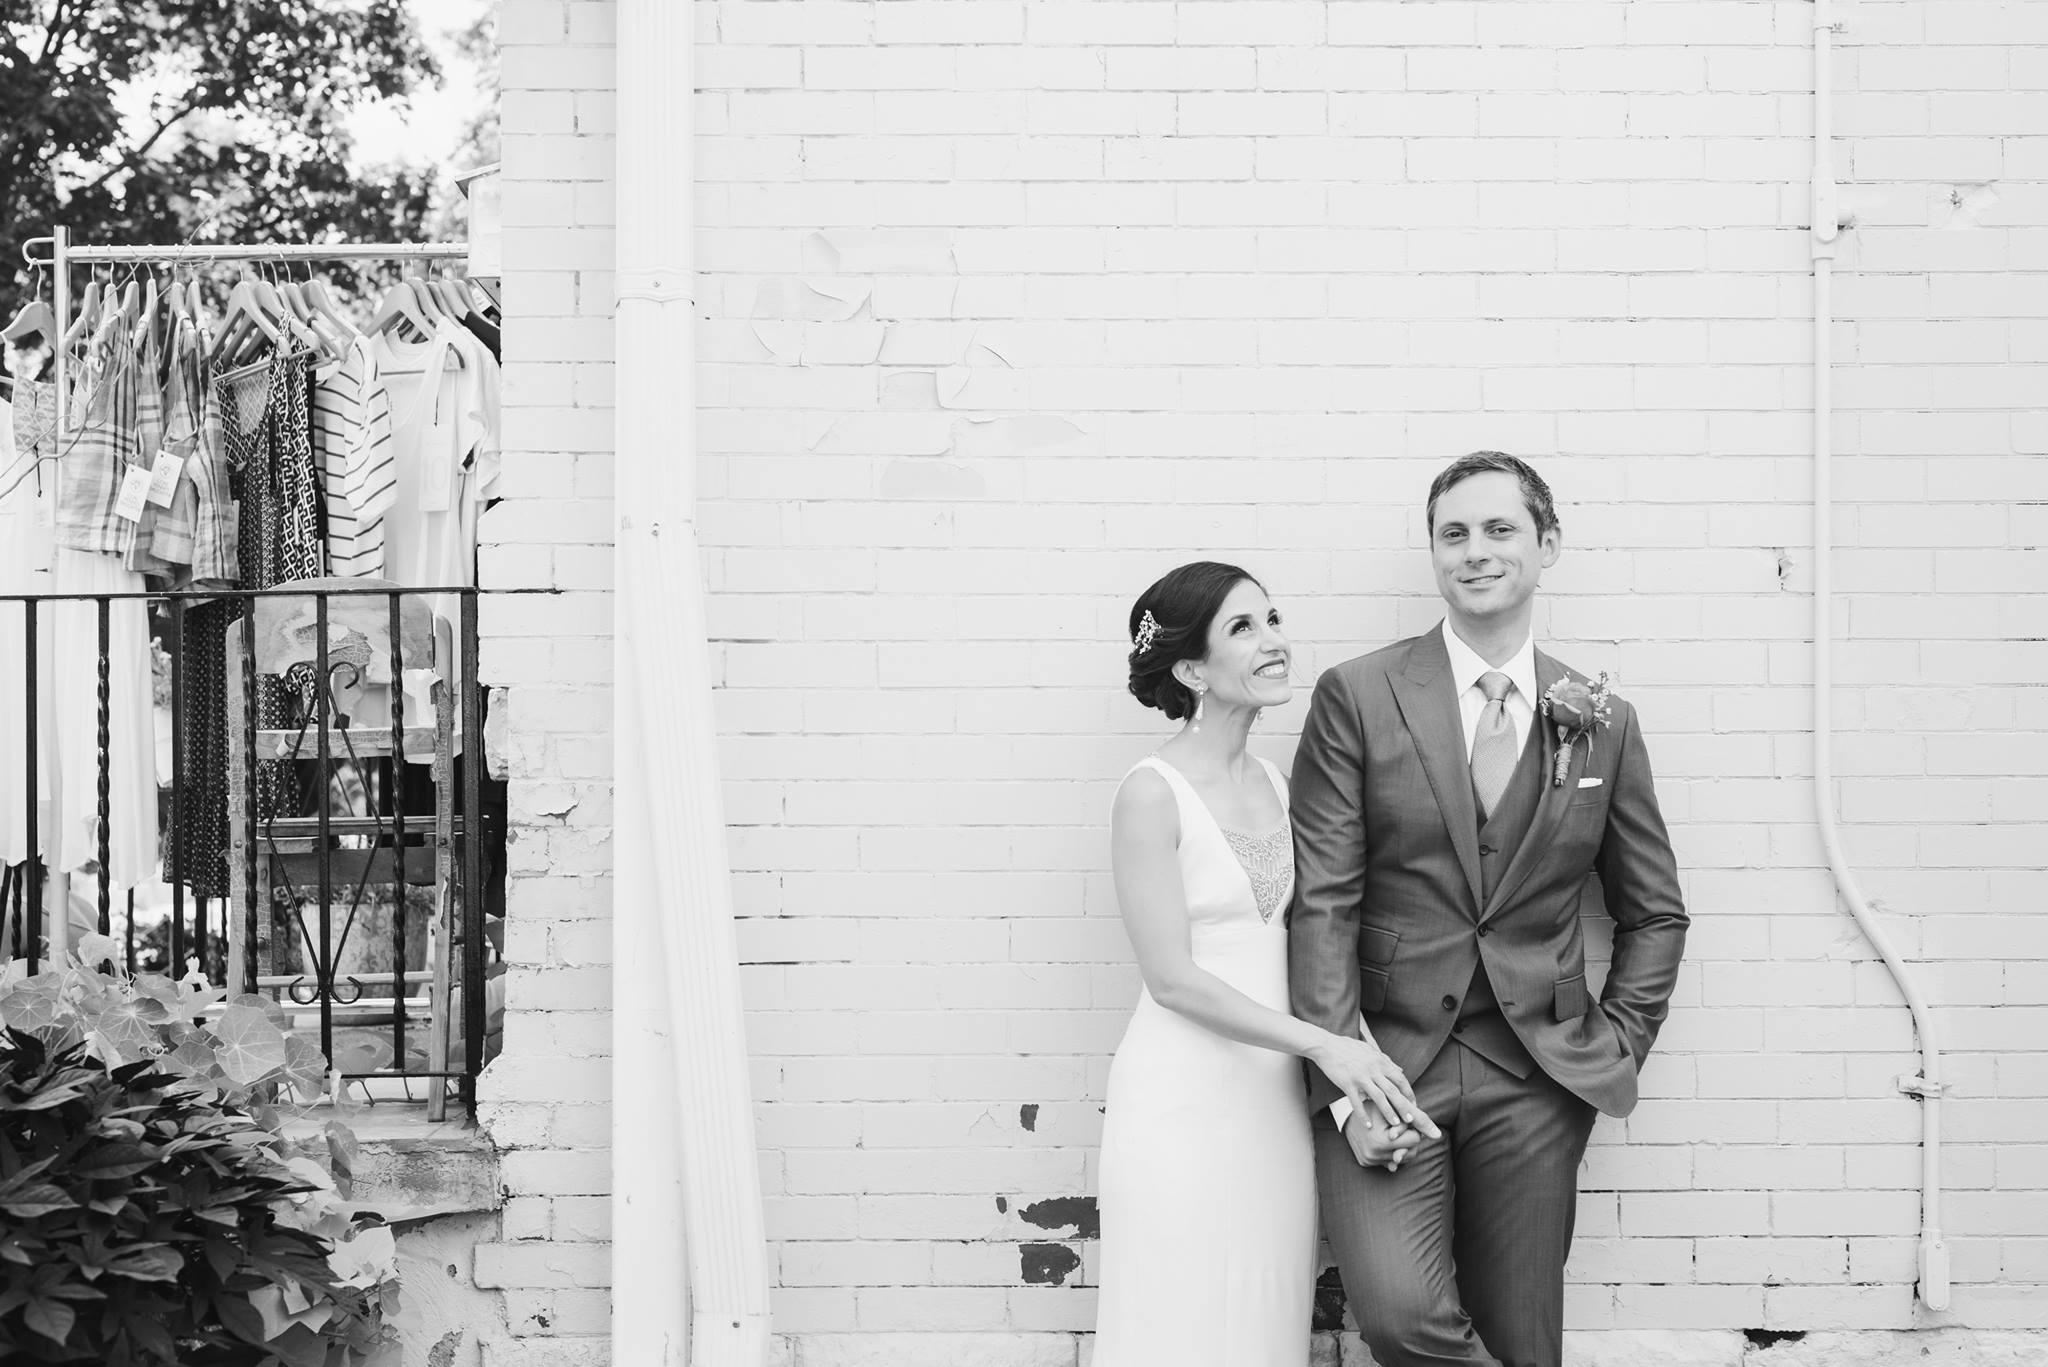 Sanam & Matt - July 23,2016  // Photographer: Sarah Renton (Blog Photography)